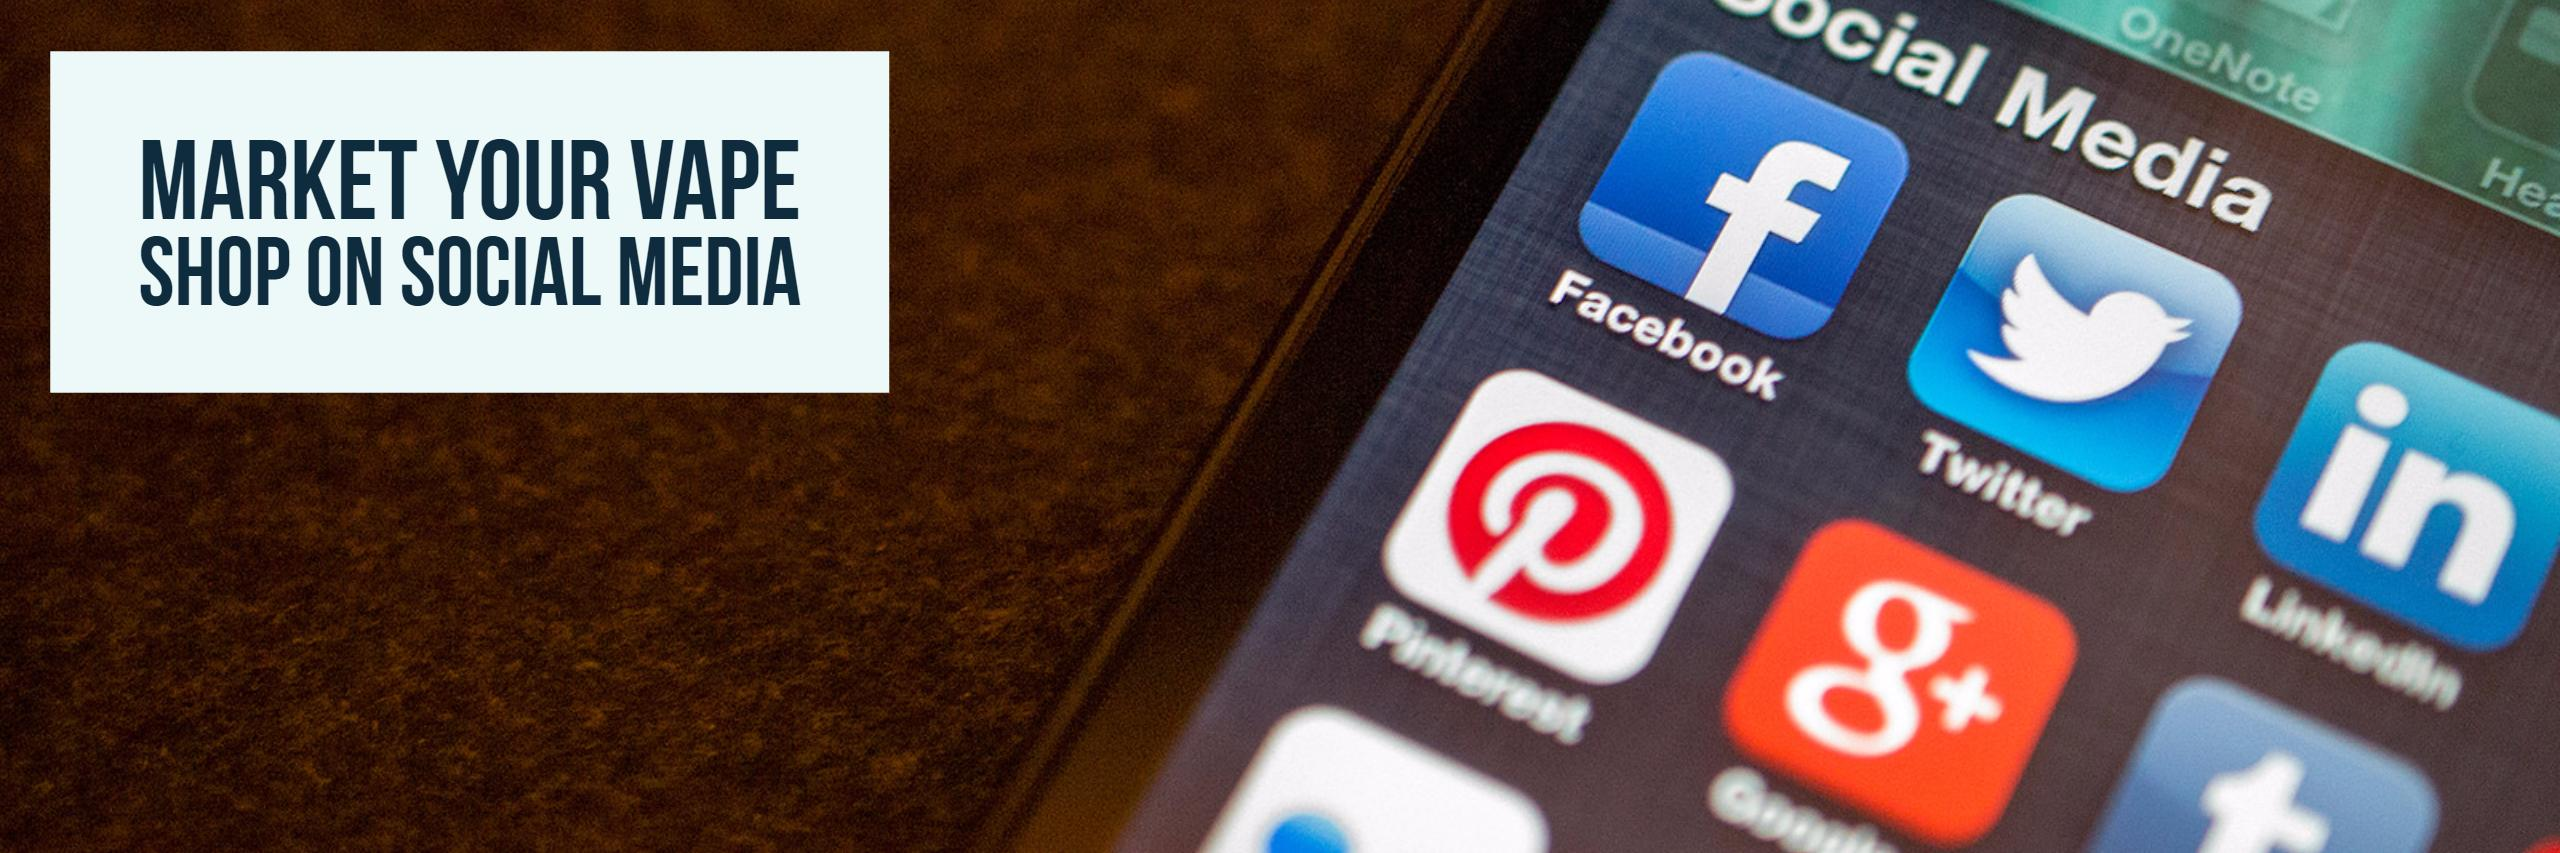 Market Your Vape Shop on Social Media